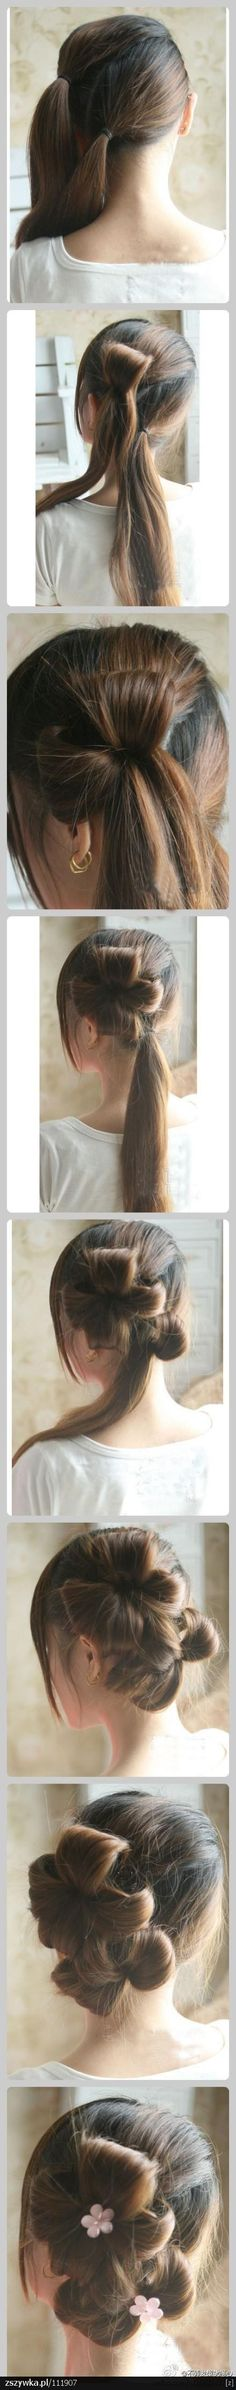 amazing flower hair!